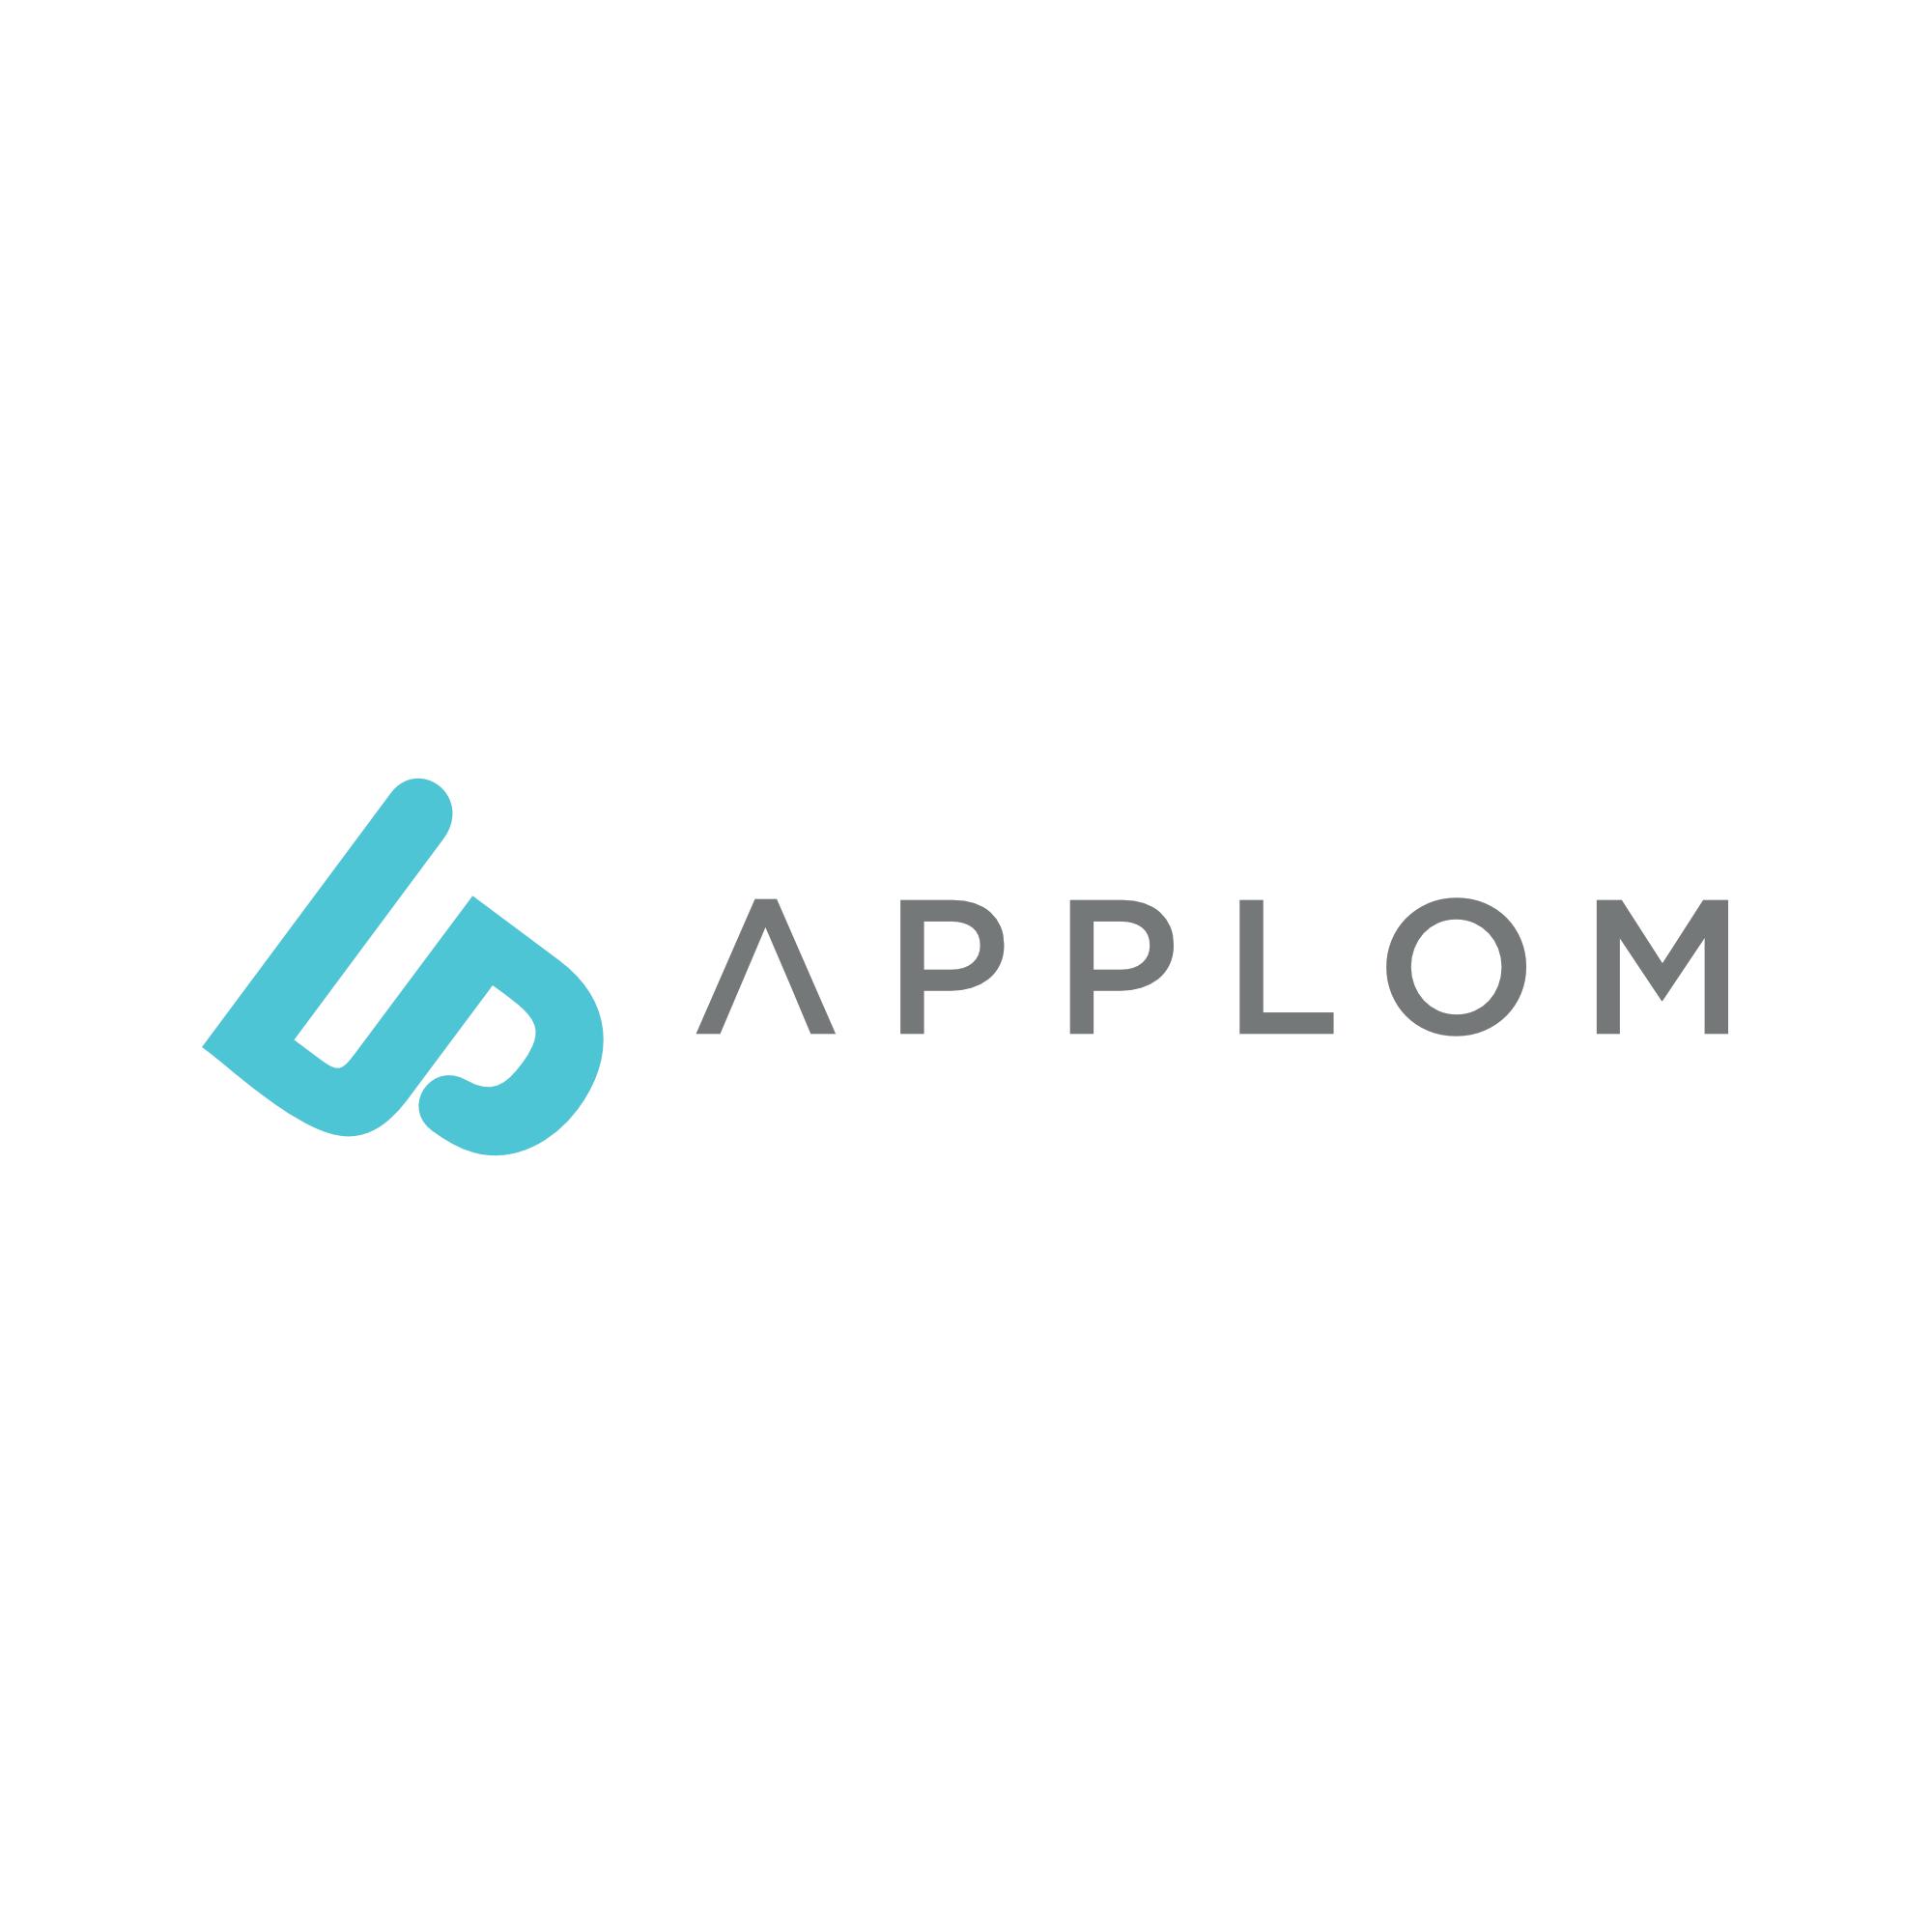 White Applom Logo 2000 x 2000.png